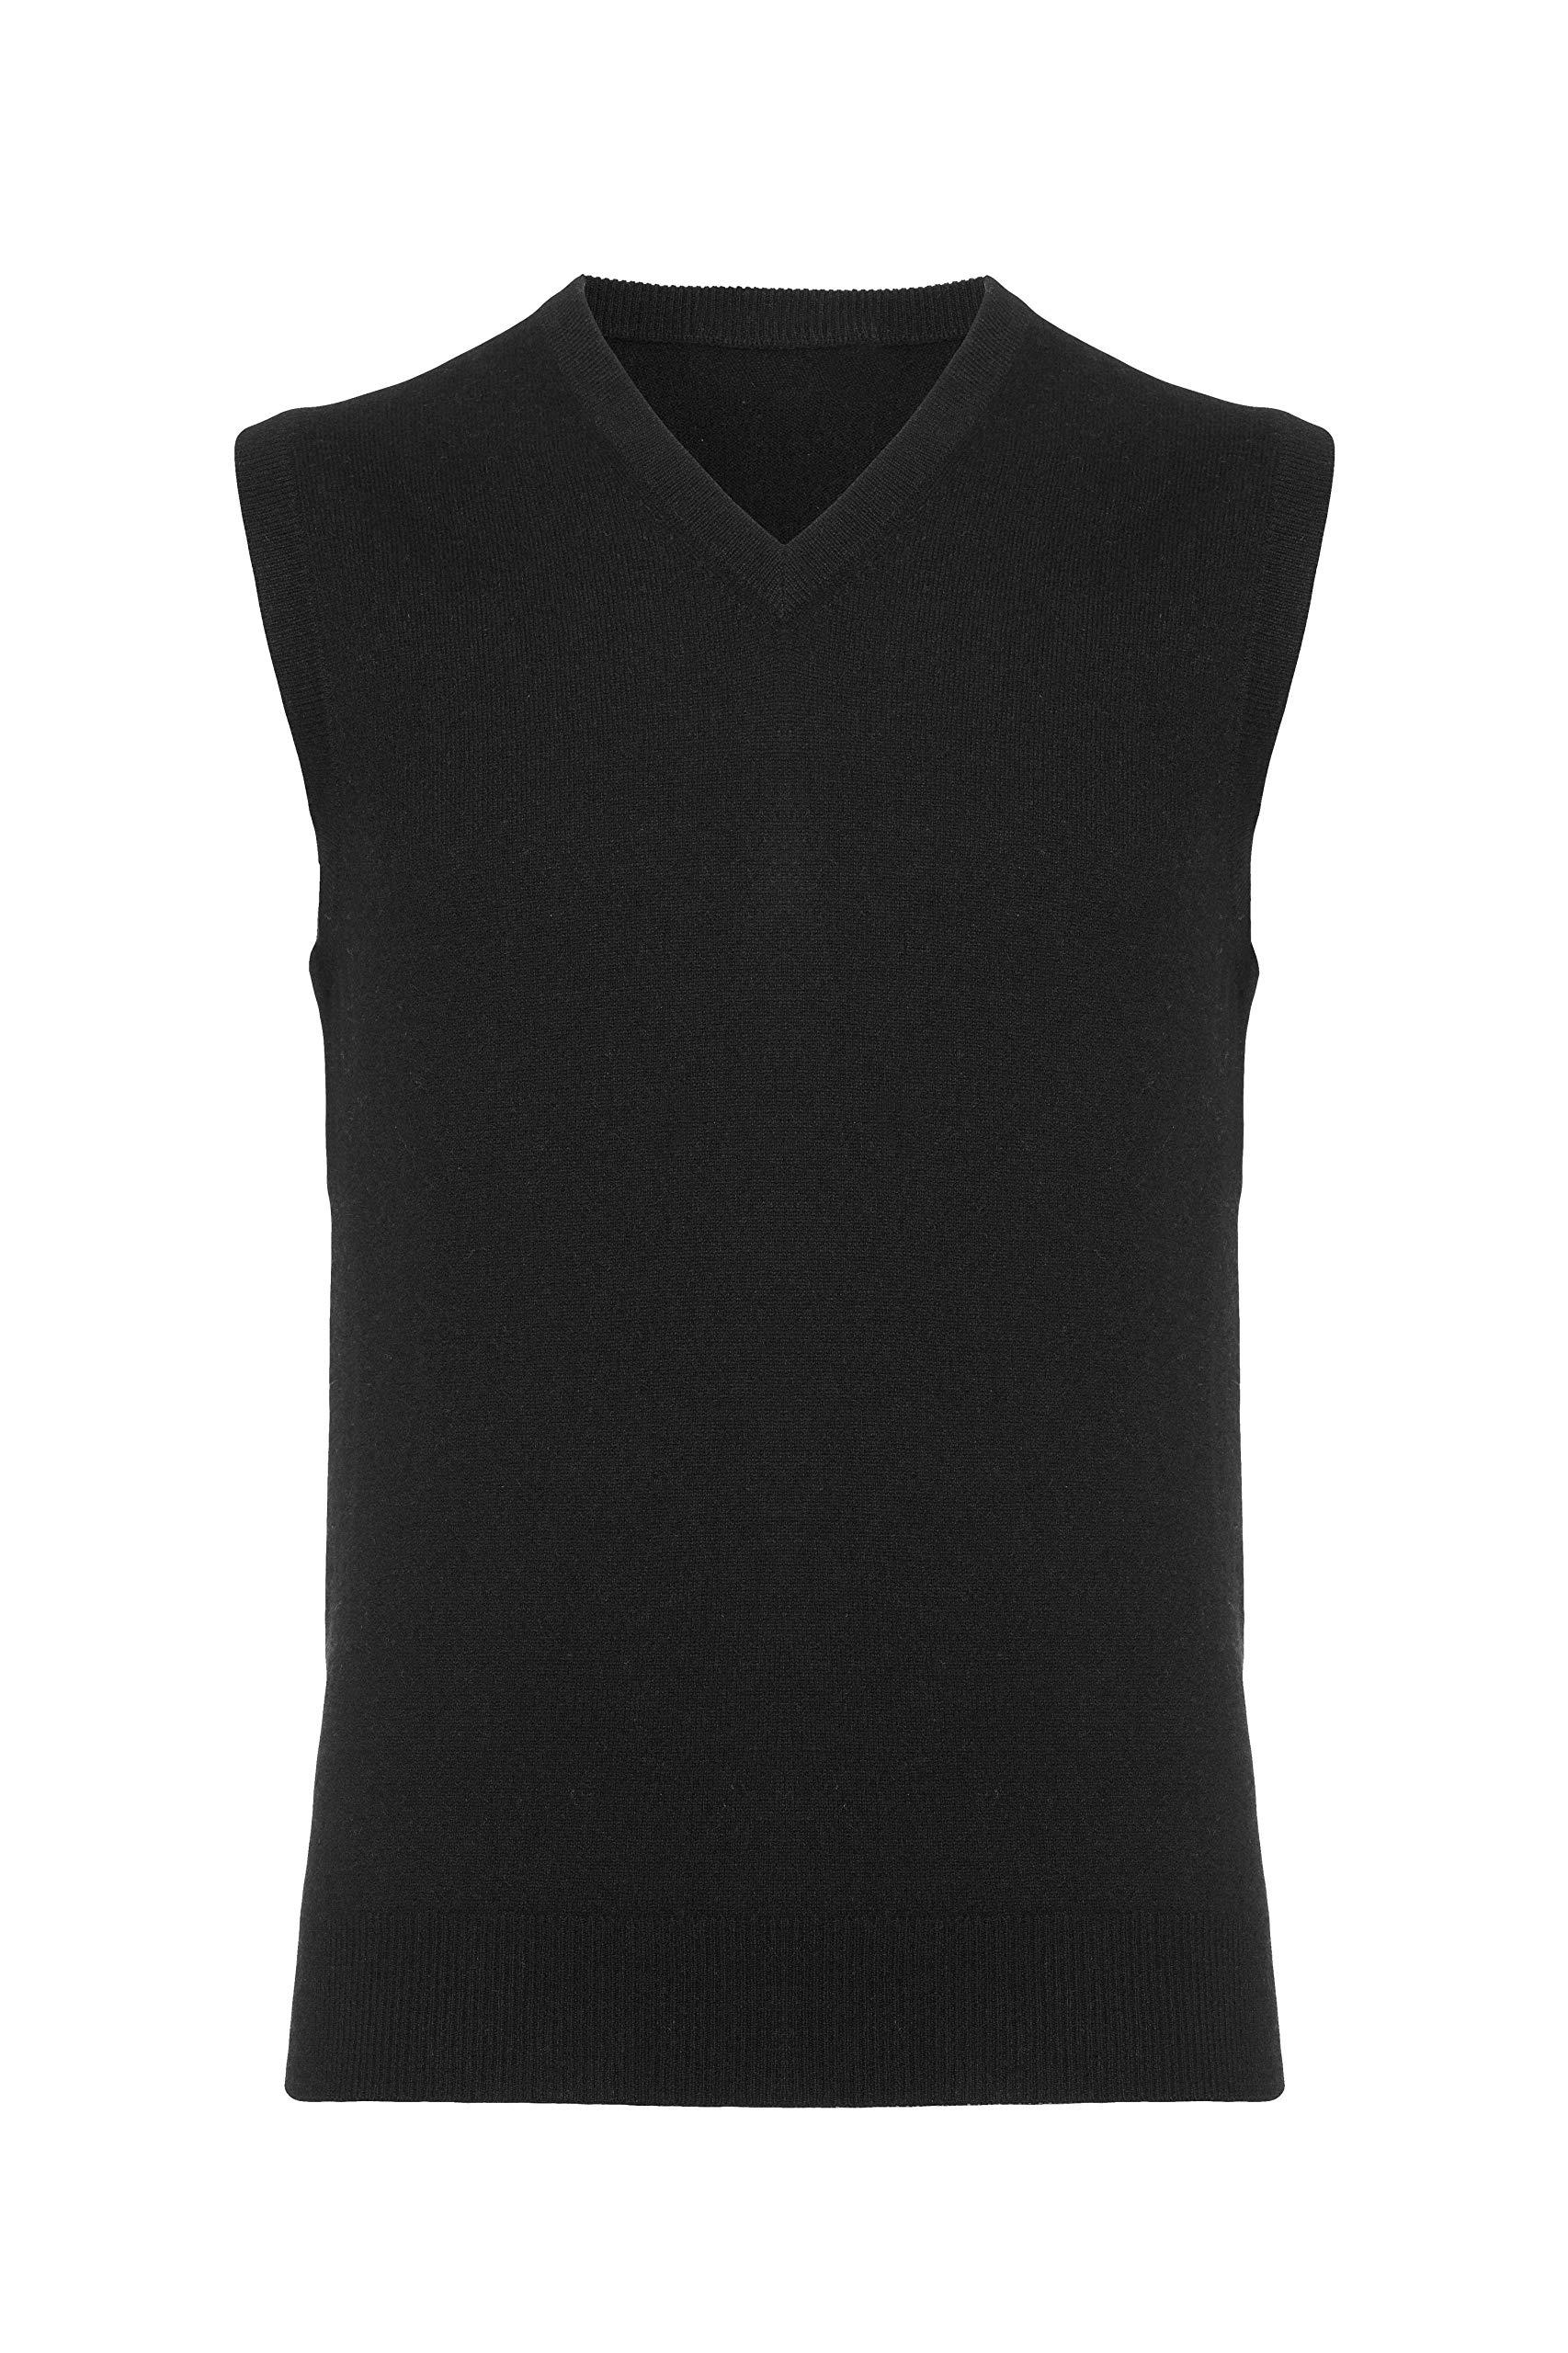 Lona Scott Men's Pure Cashmere Vest Black M by Lona Scott